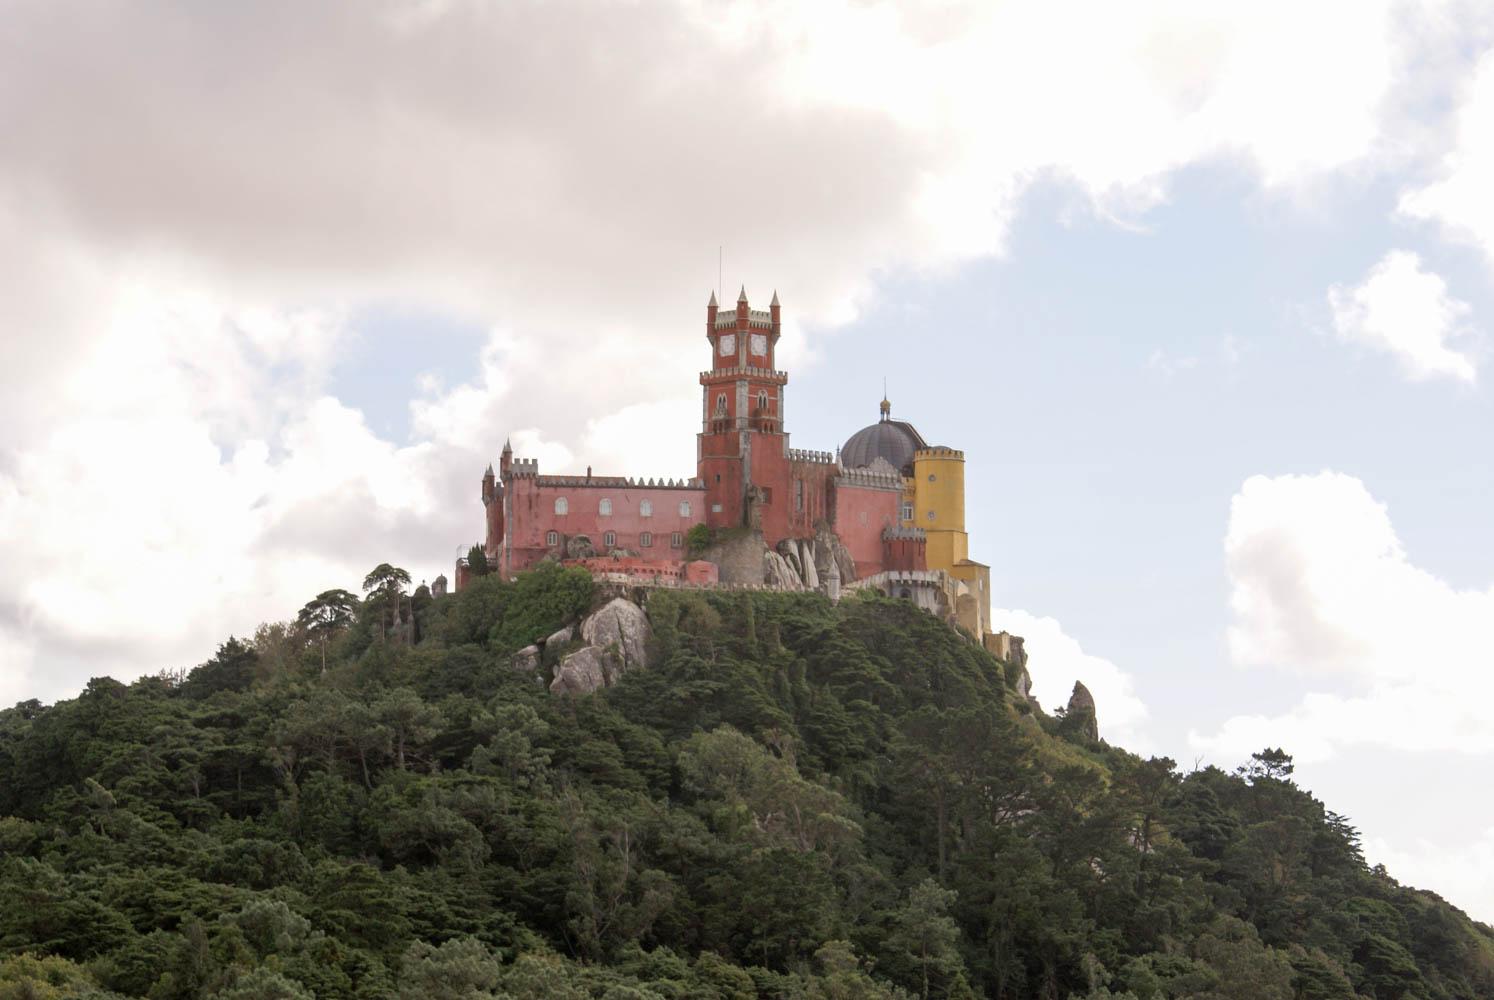 Castelo de Pena dominates the hill